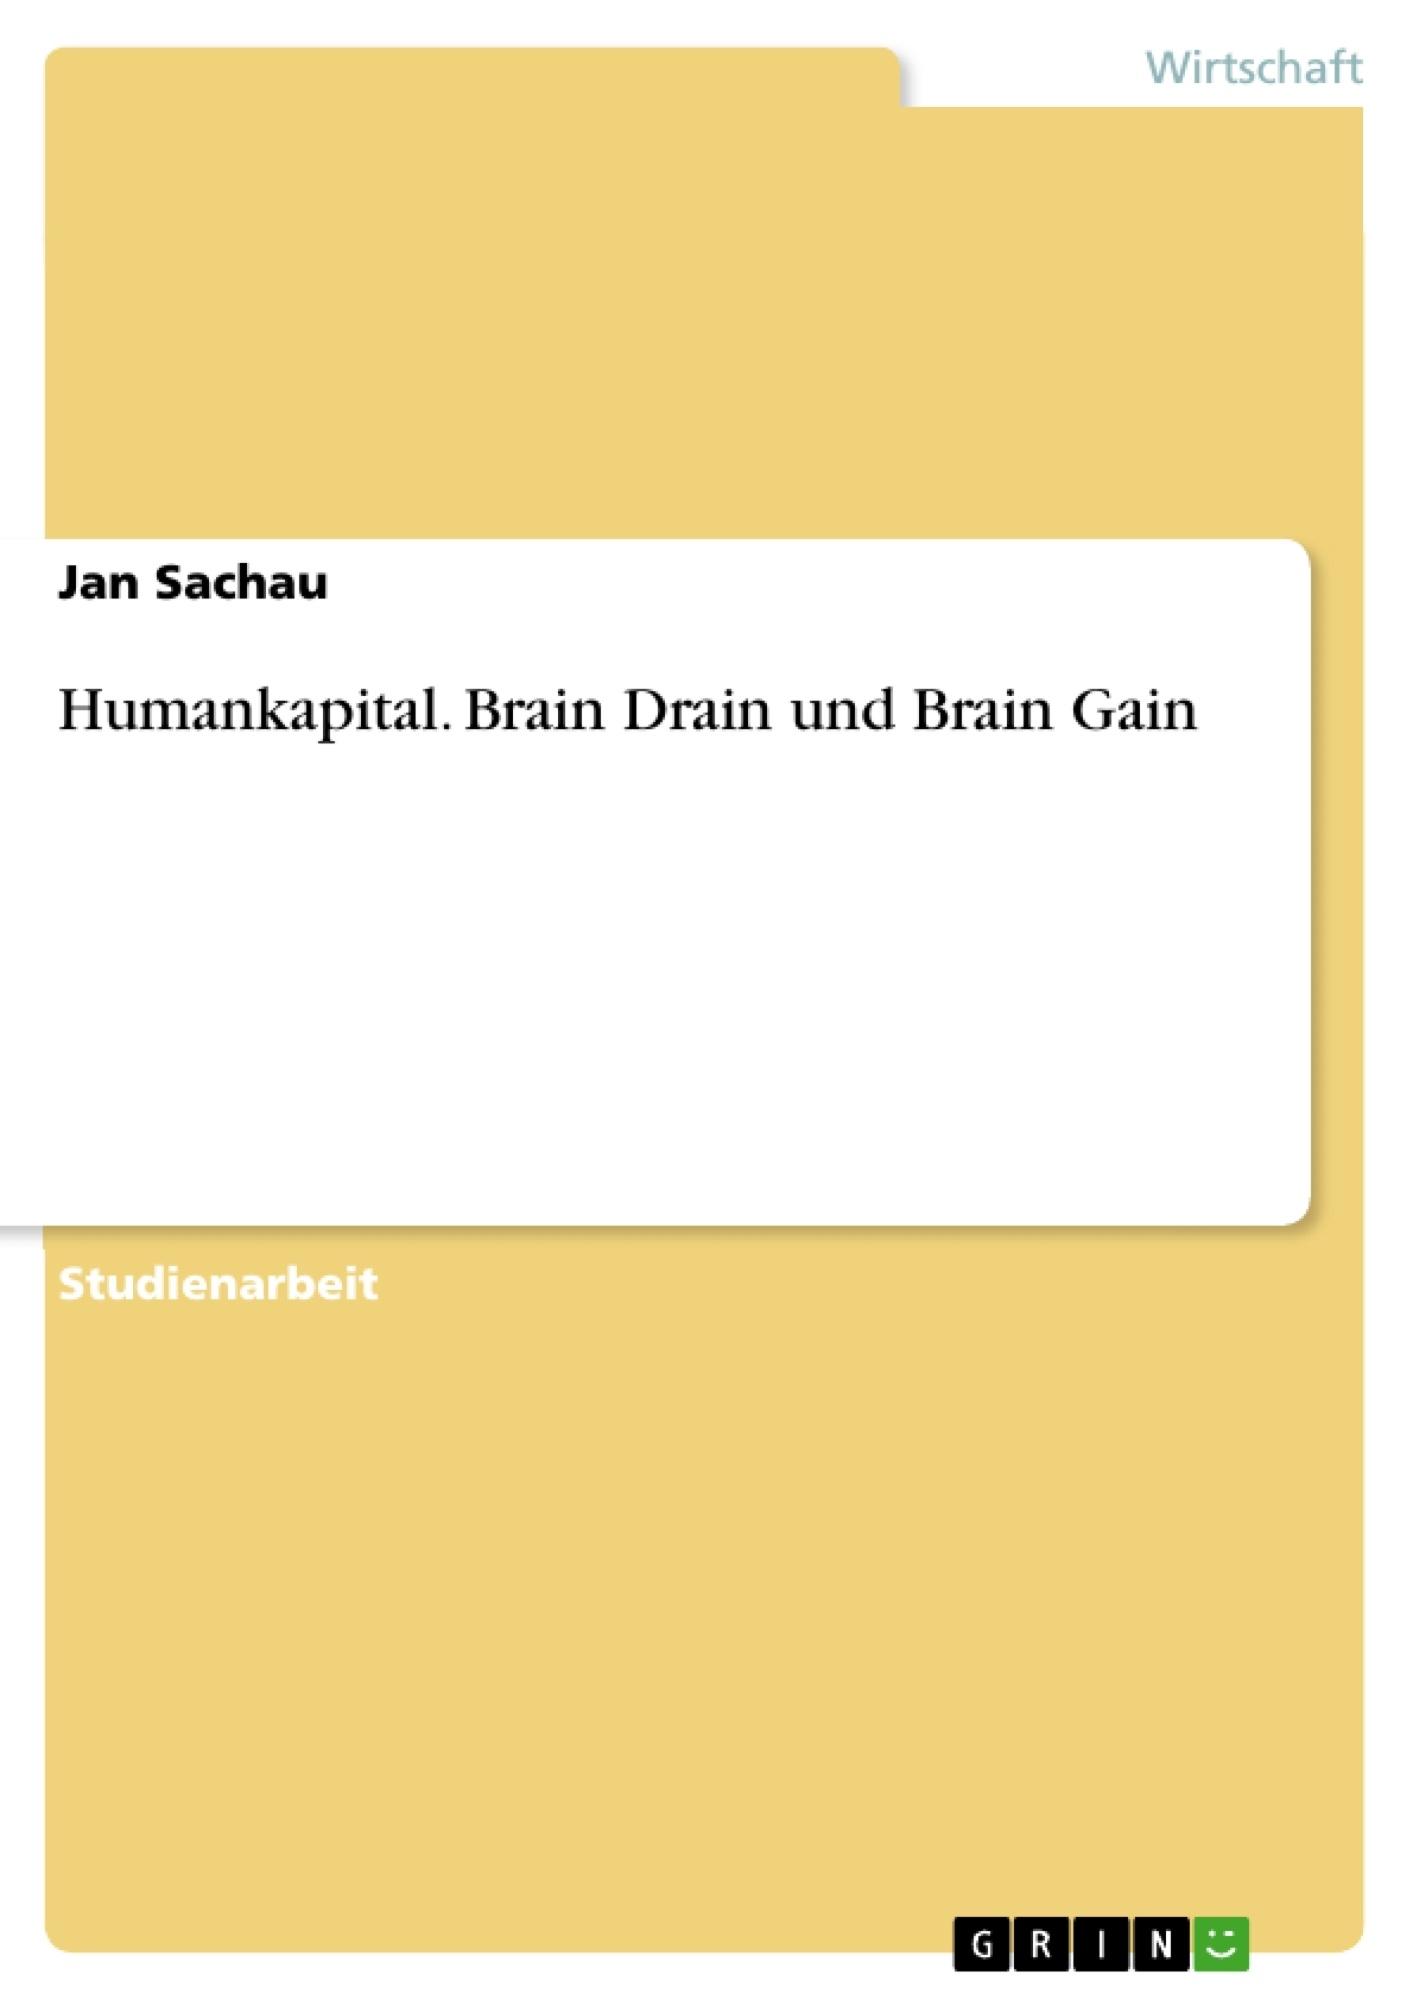 Titel: Humankapital. Brain Drain und Brain Gain